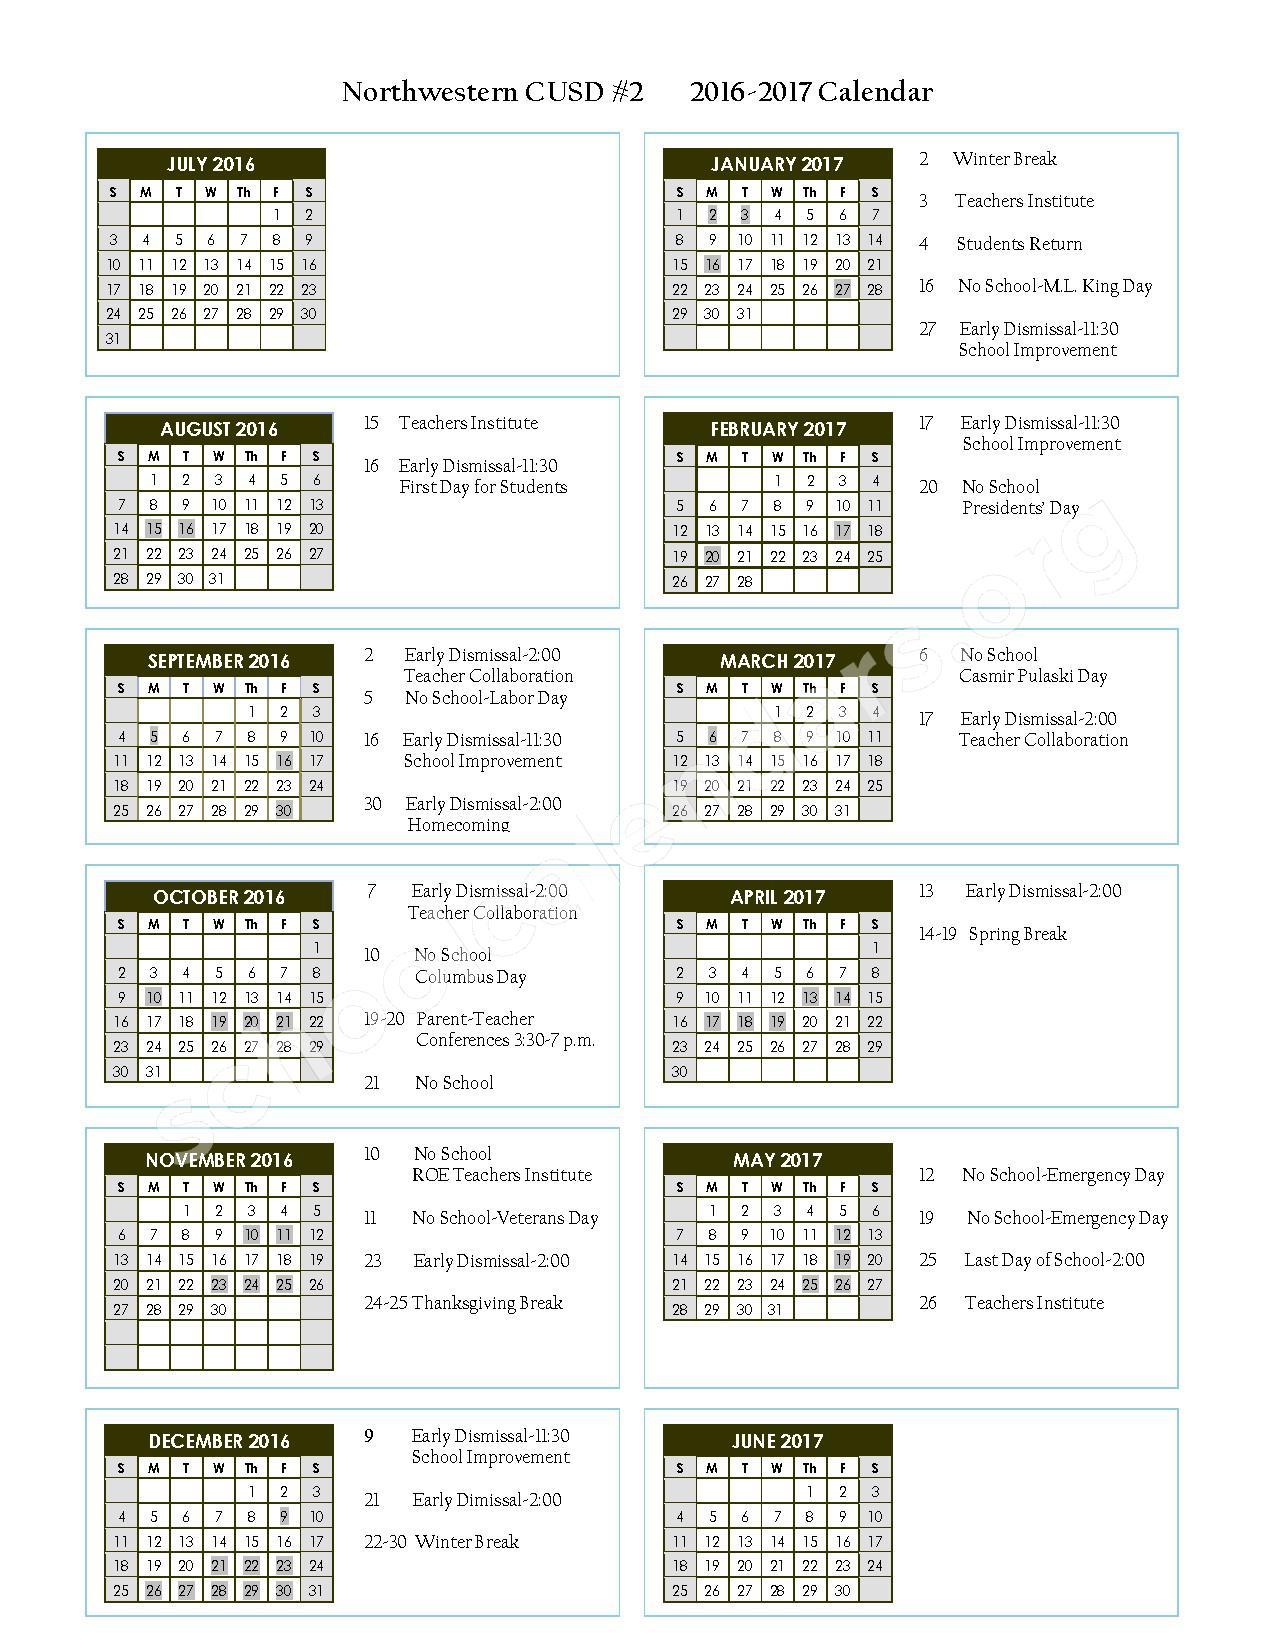 2016 - 2017 District Calendar – Northwestern Community Unit School District 2 – page 1